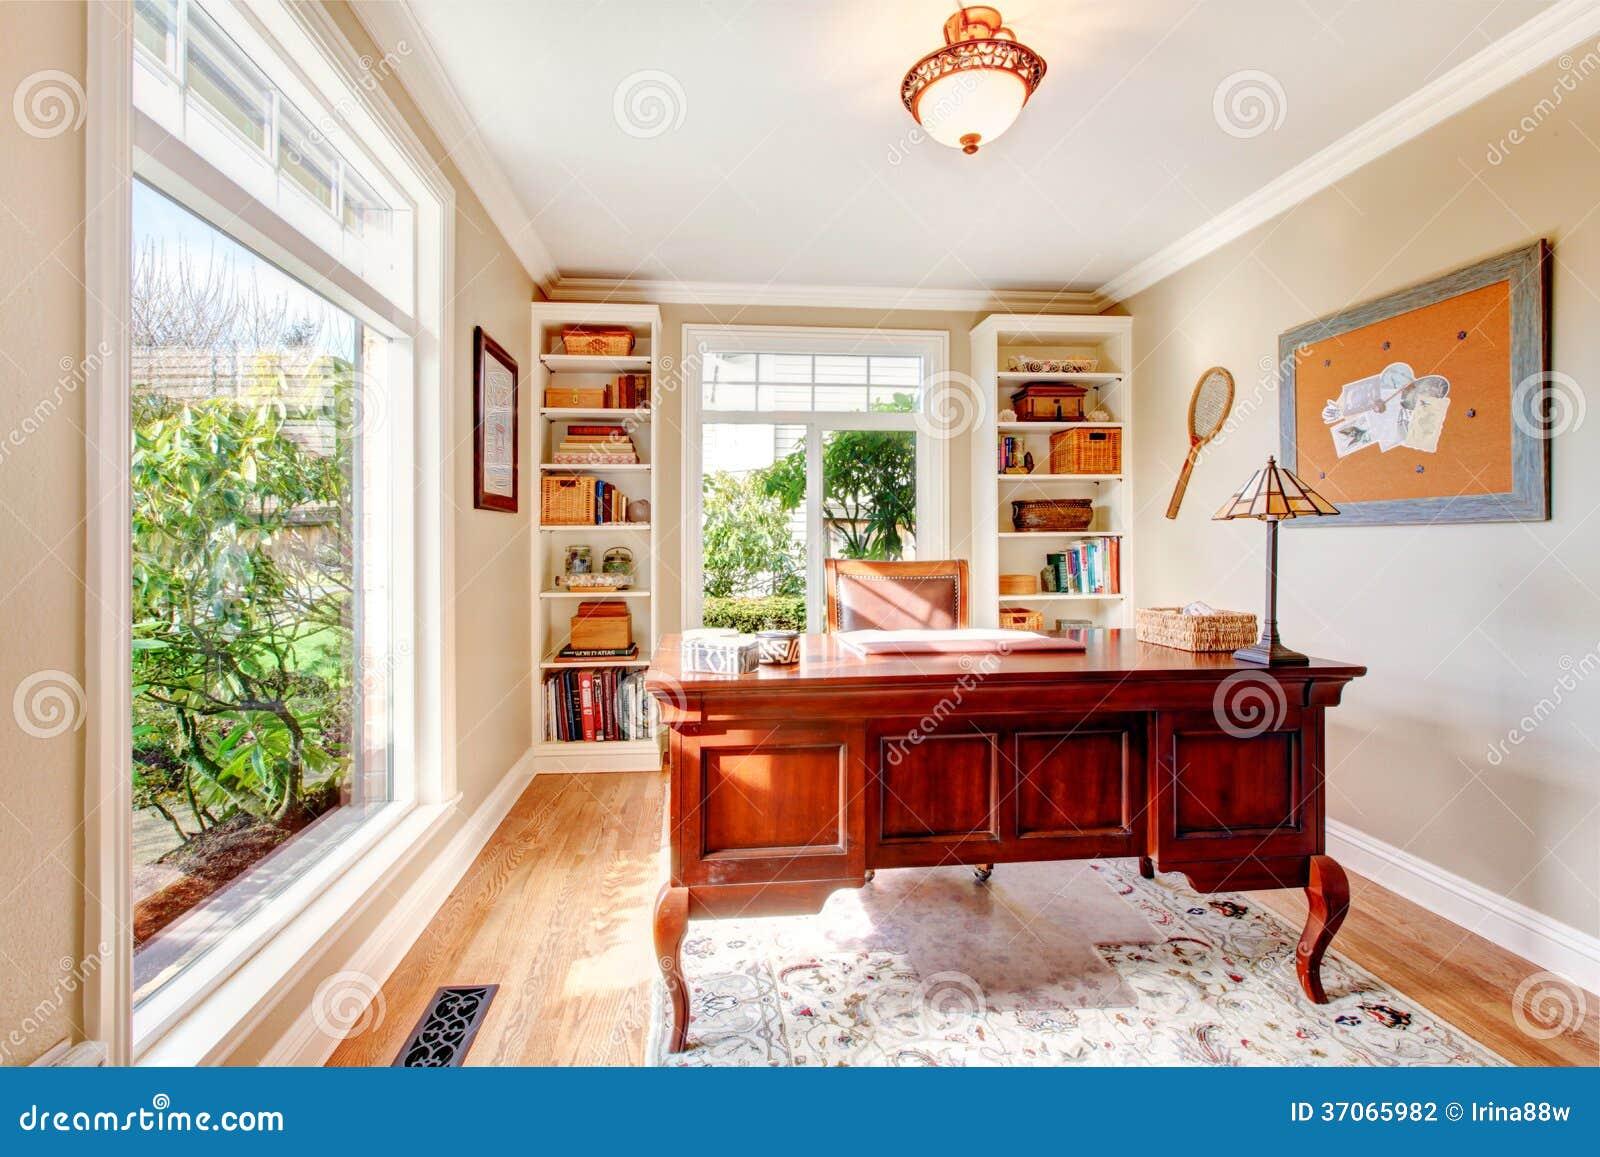 Bright office room with hardwood floor, floor-to-ceiling window, wall